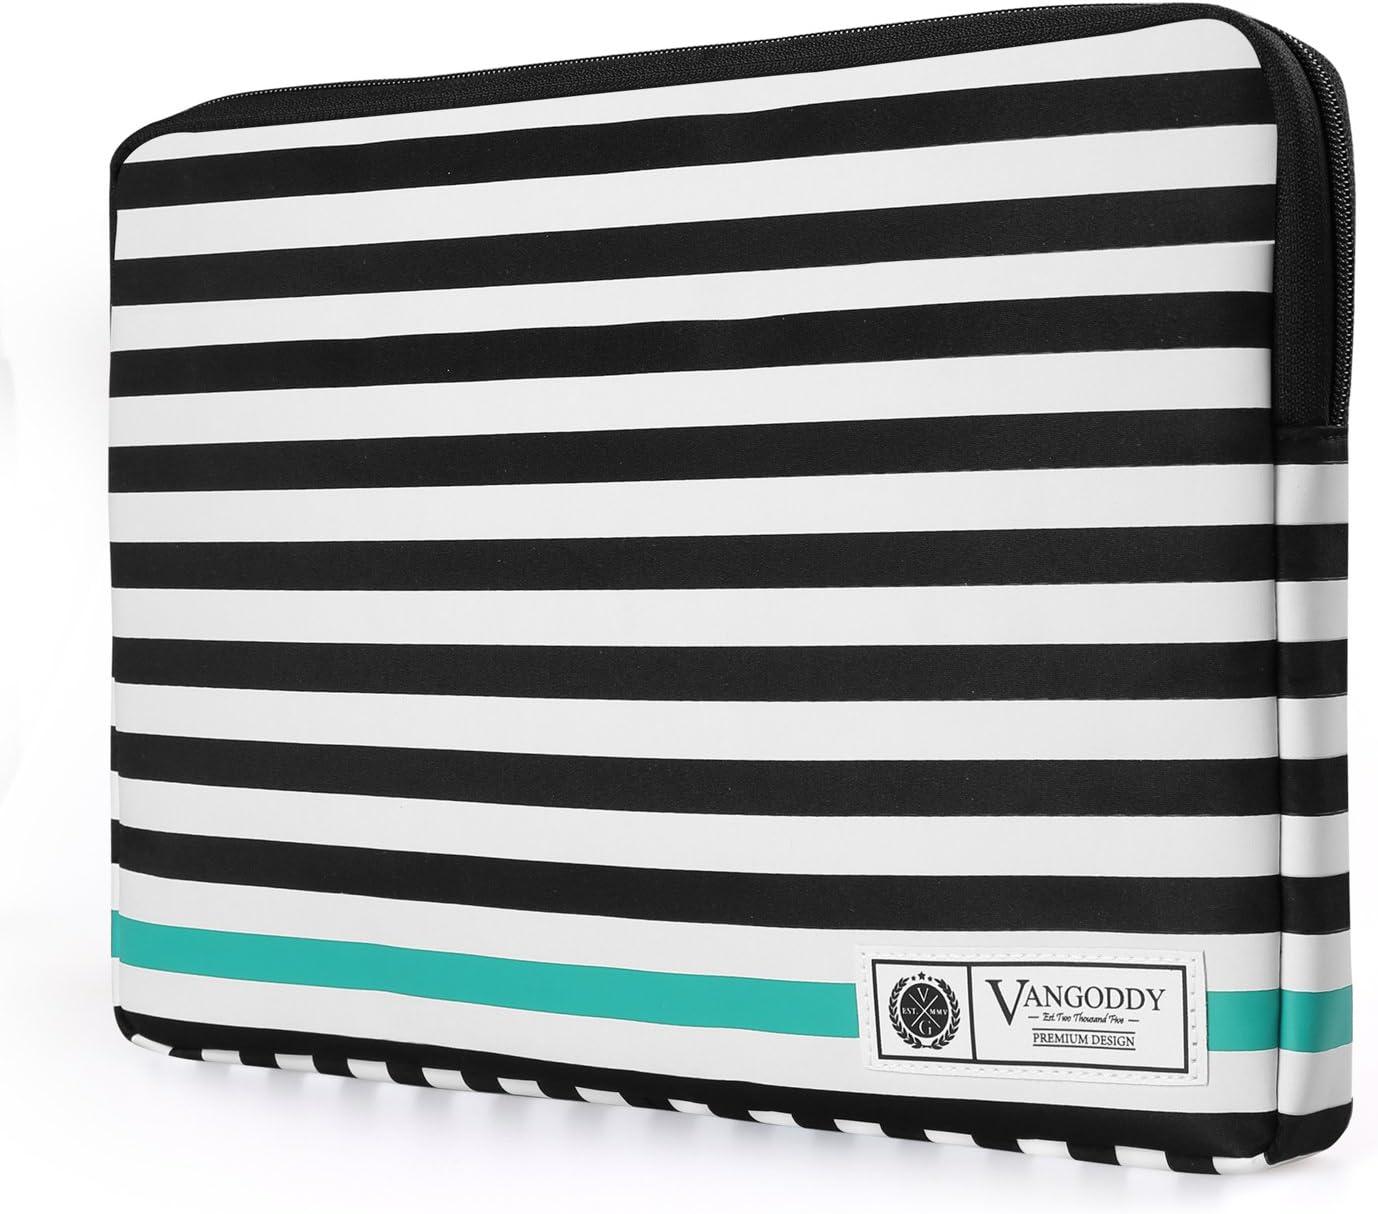 Vangoddy 13.3 inch Laptop Case for Dell Inspiron, Allienware, Vostro, Latitude XPS Notebook Case